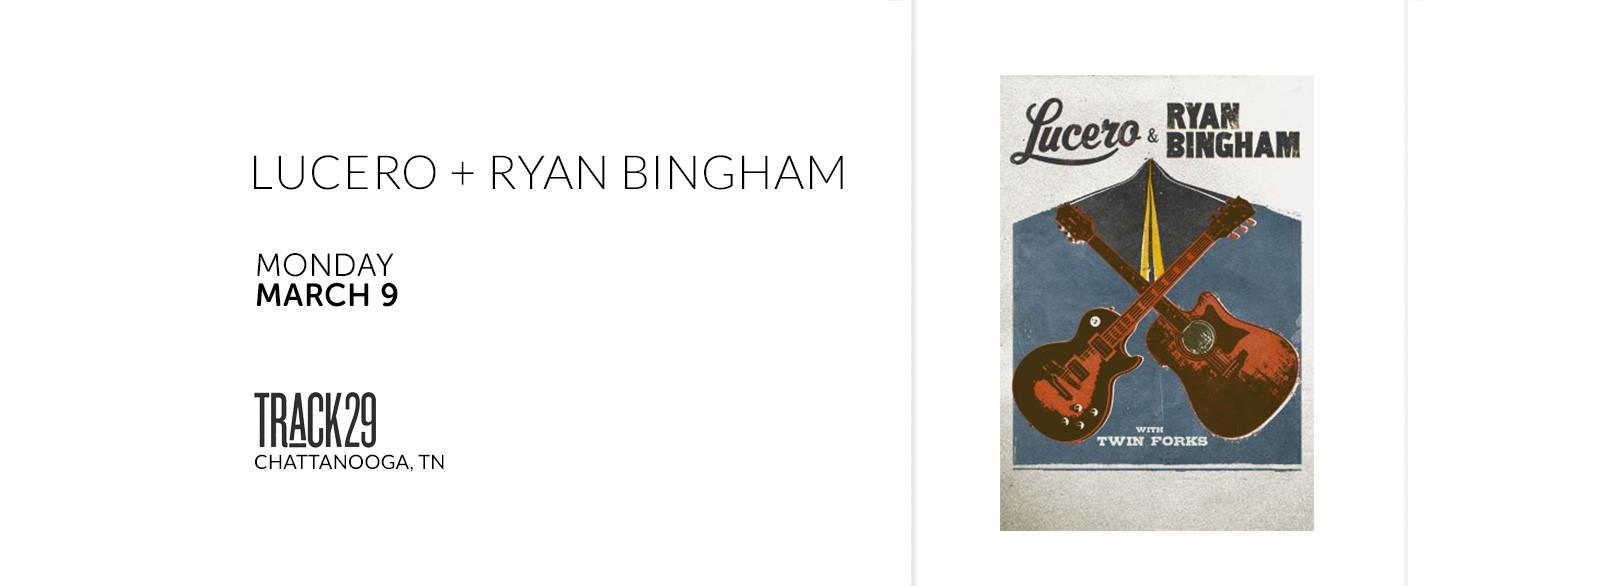 Lucero + Ryan Bingham @ Track 29